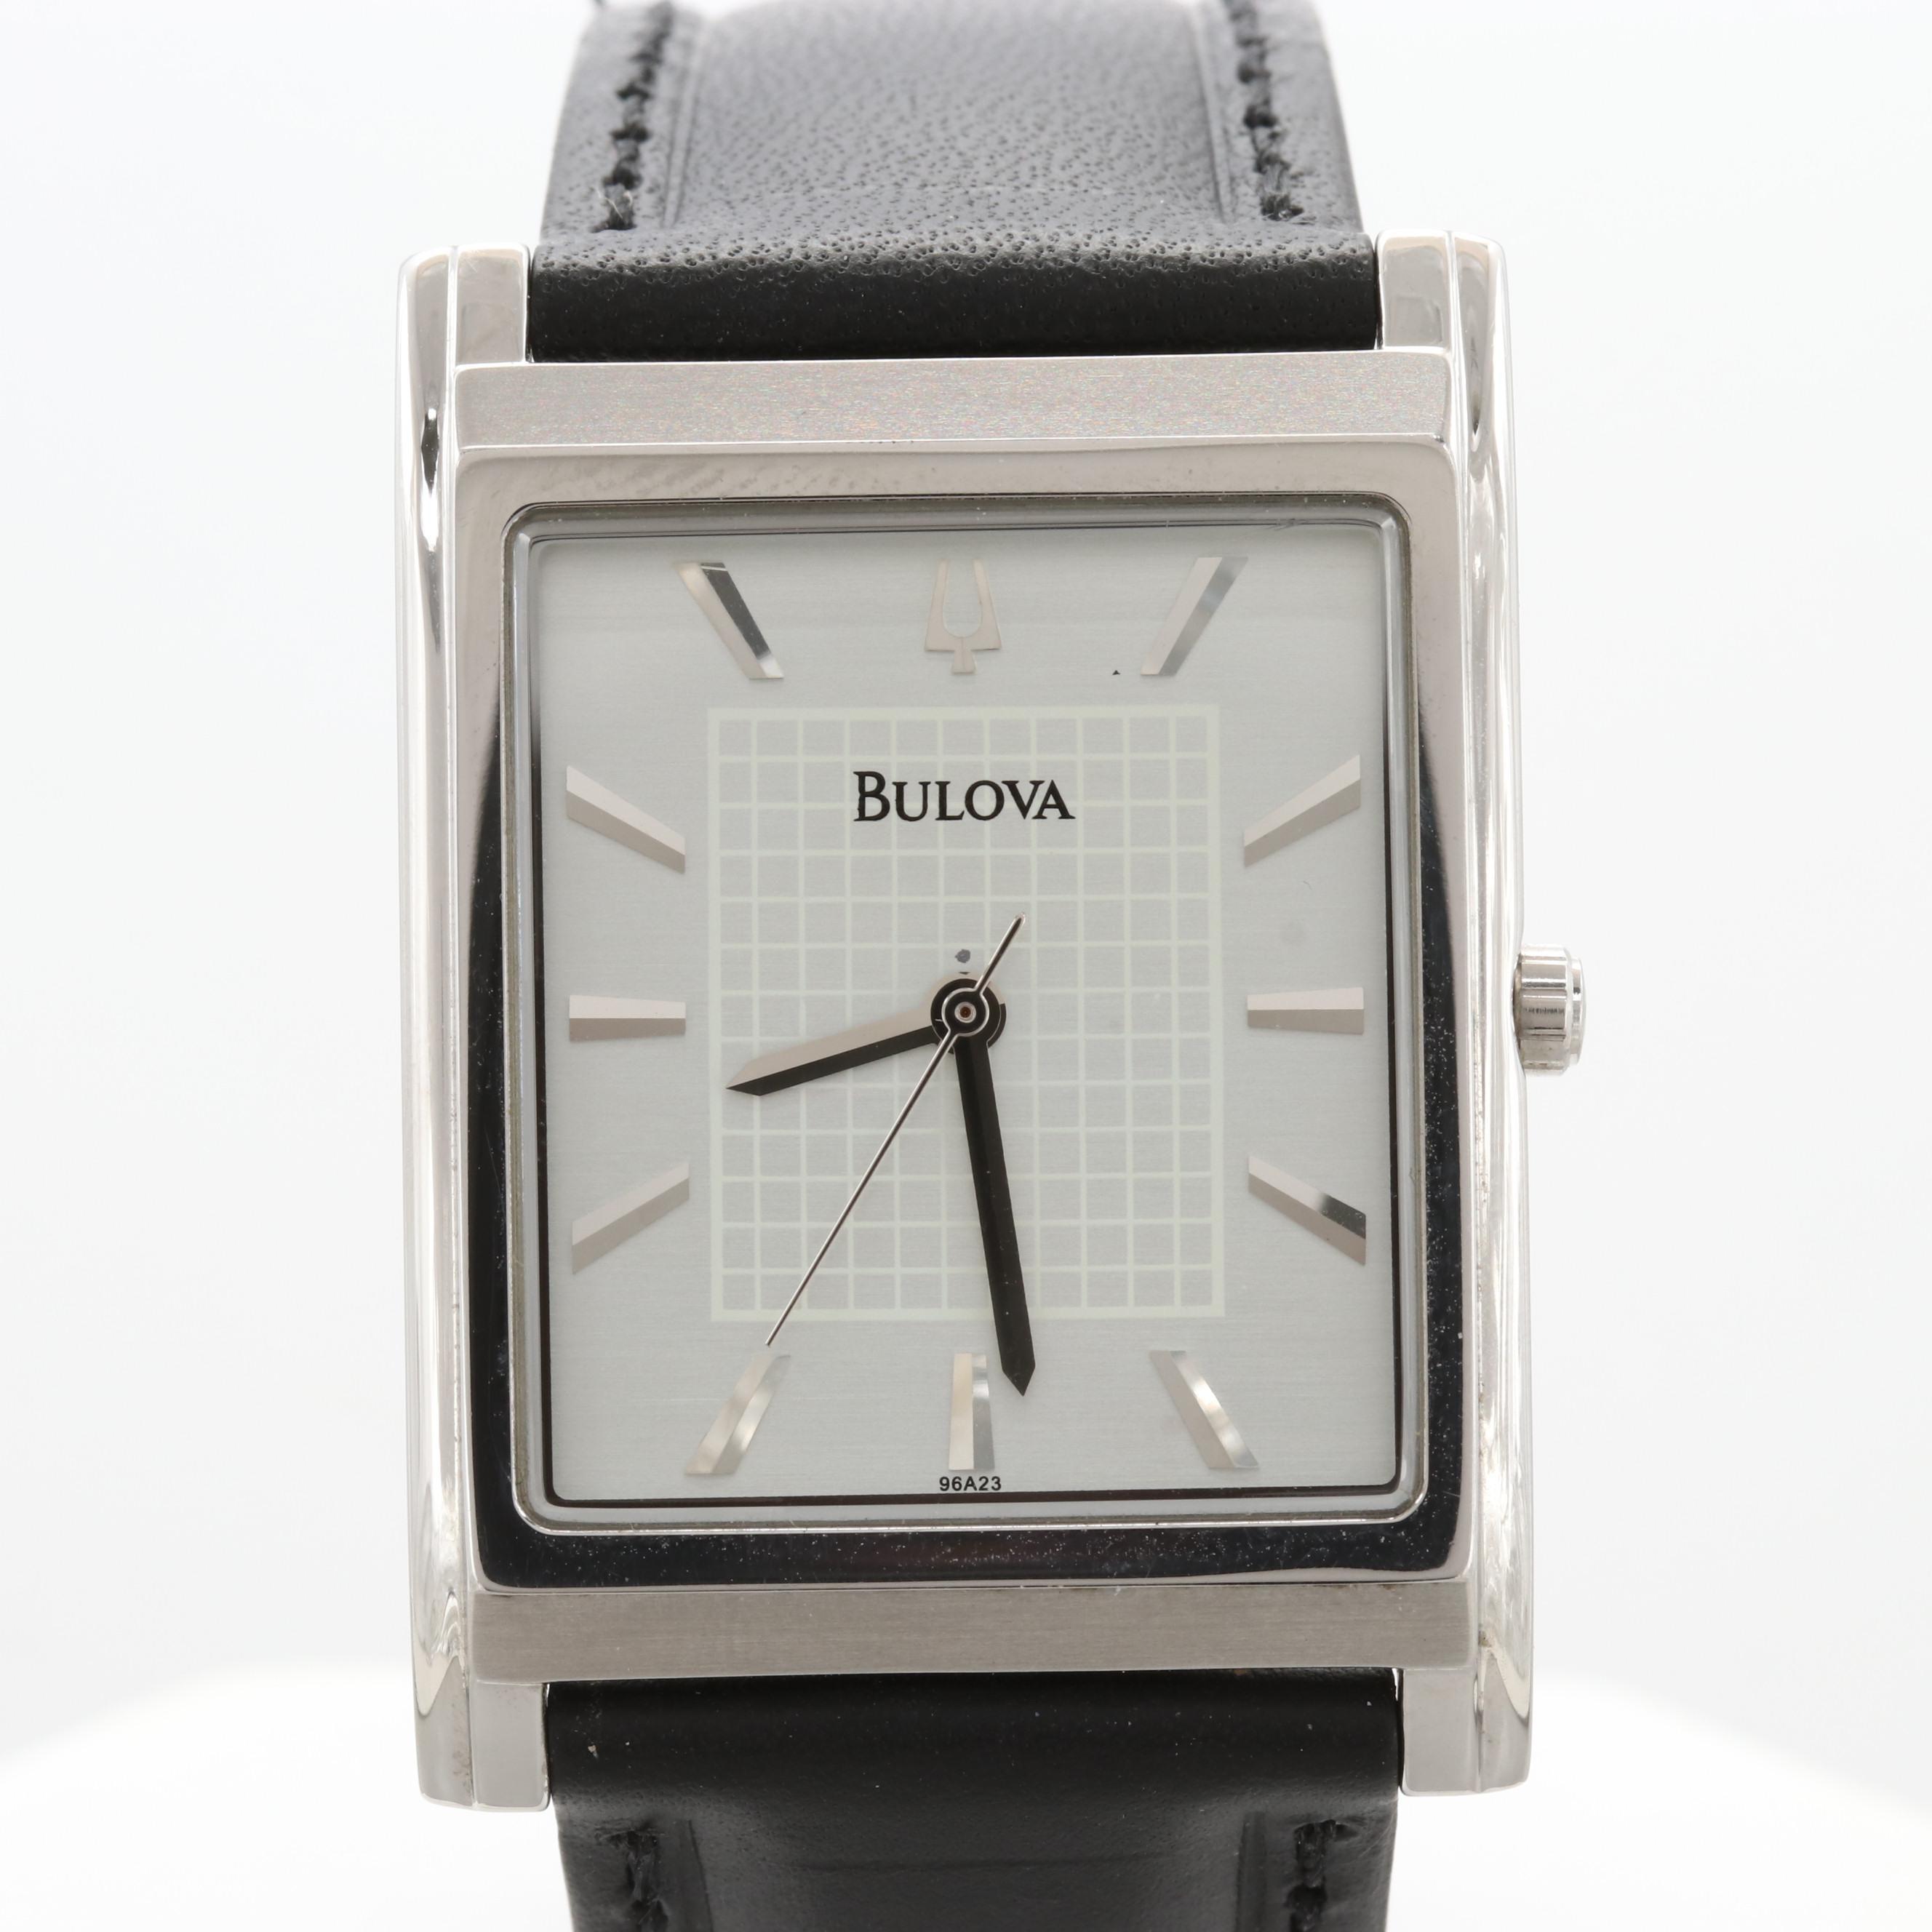 Bulova Model 96A23 Quartz Wristwatch